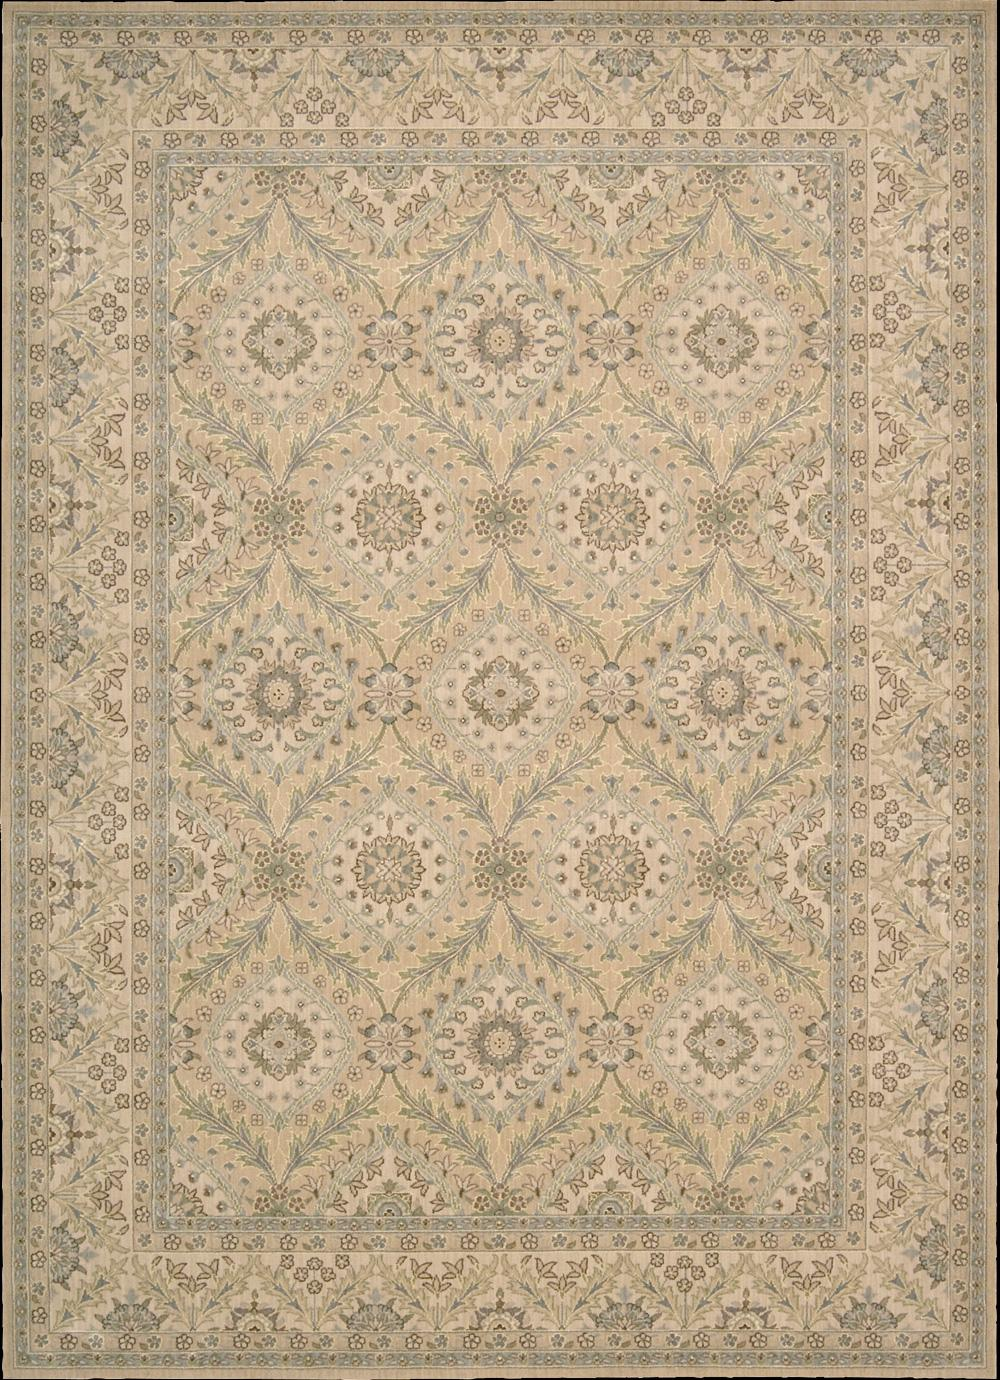 "Nourison Persian Empire Area Rug 9'6"" x 13' - Item Number: 44301"